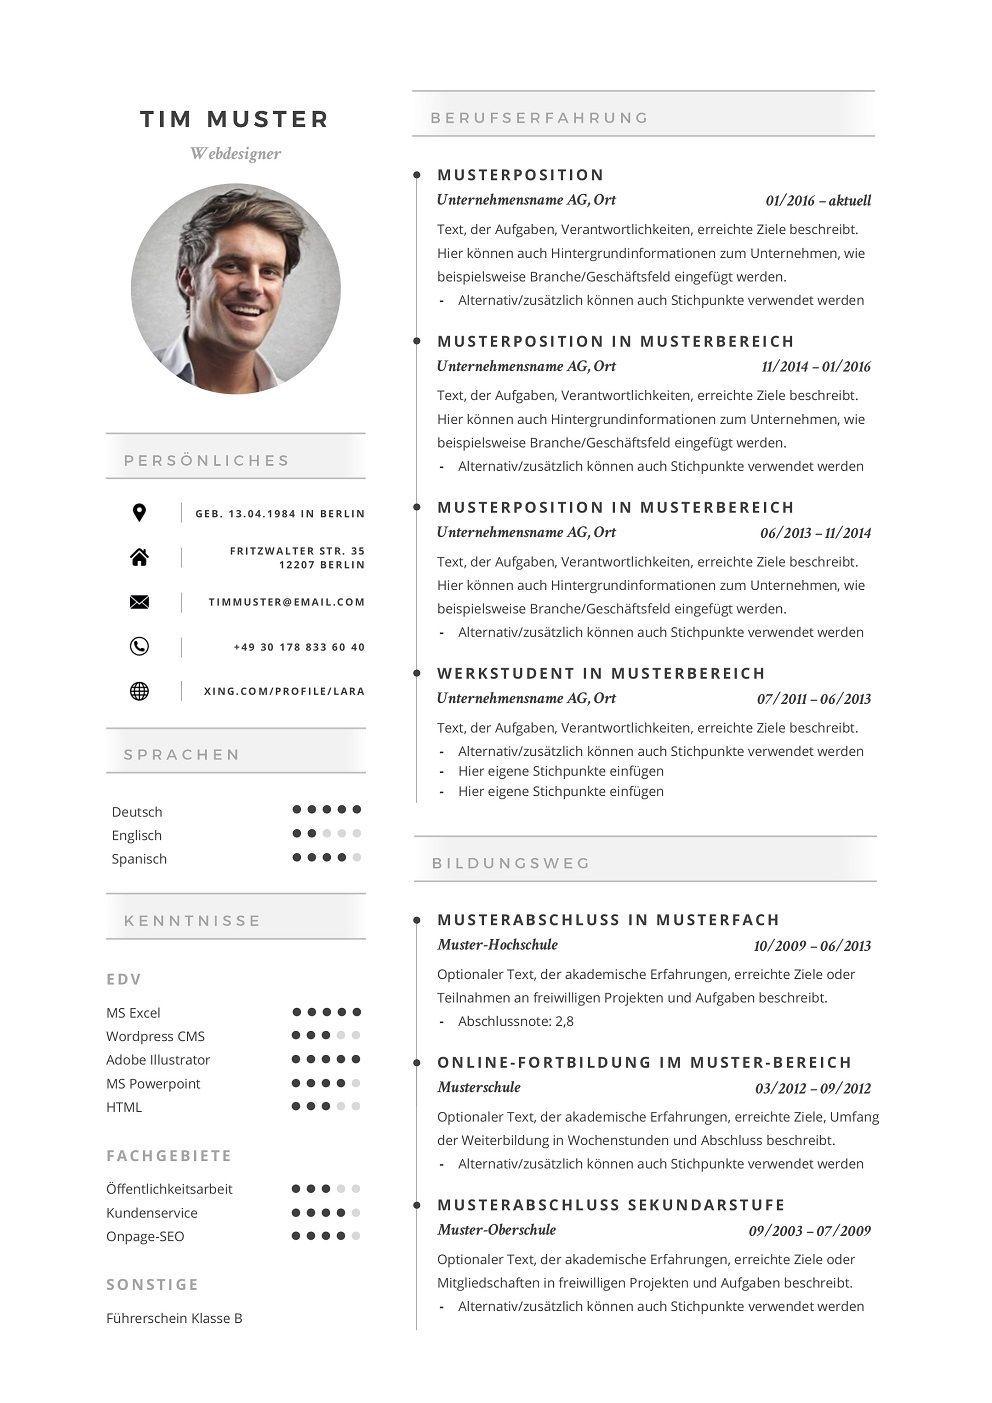 Premium Bewerbungsmuster 9 Lebenslaufdesigns De Marketing Premium Bewerbungsmuster 9 Lebenslaufdesigns De Resume Templates Resume Resume Design